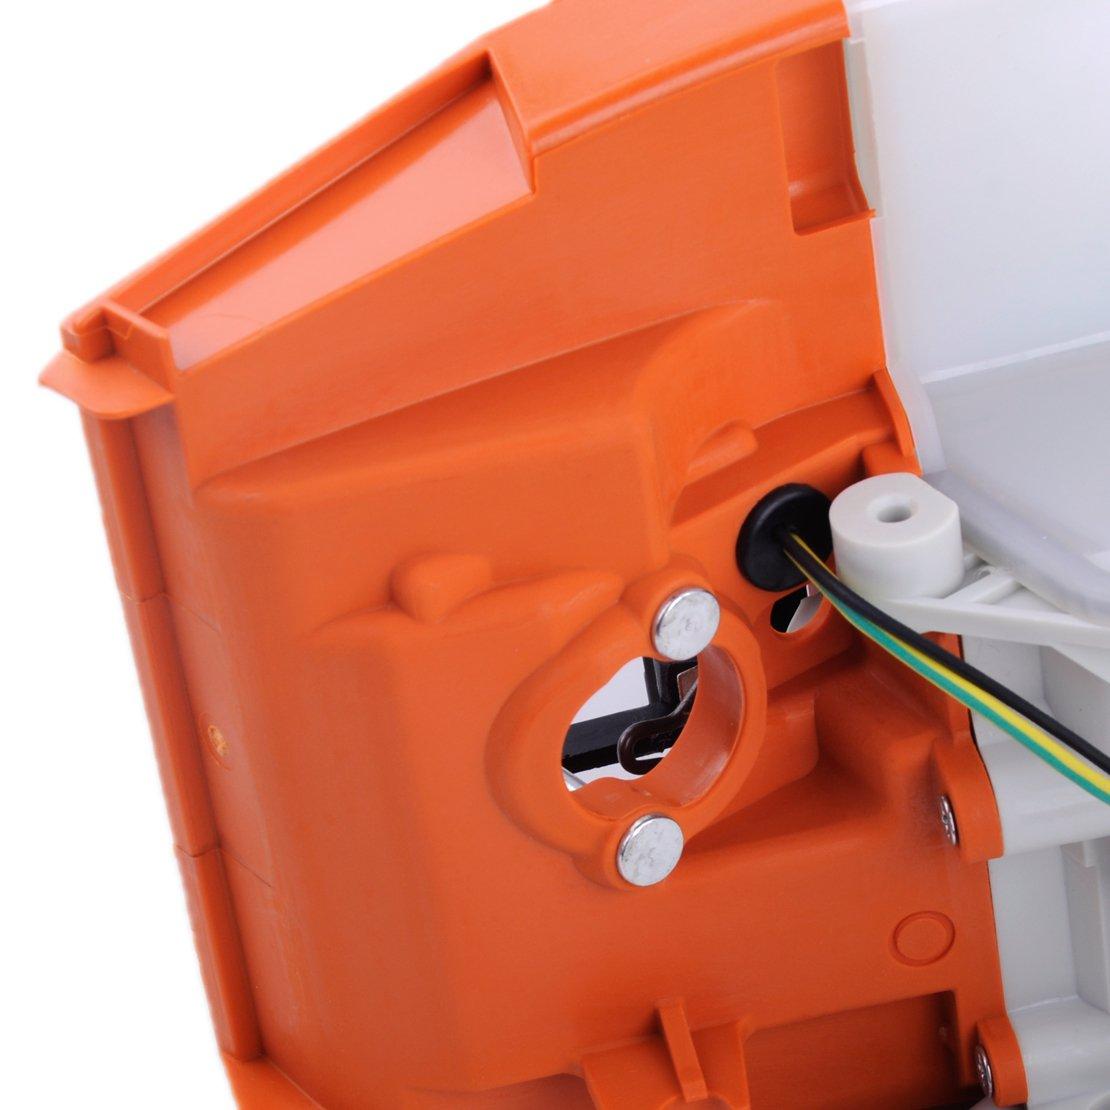 LETAOSK Gas-Tank-Heckgriff passend f/ür Stihl MS660 066 MS650